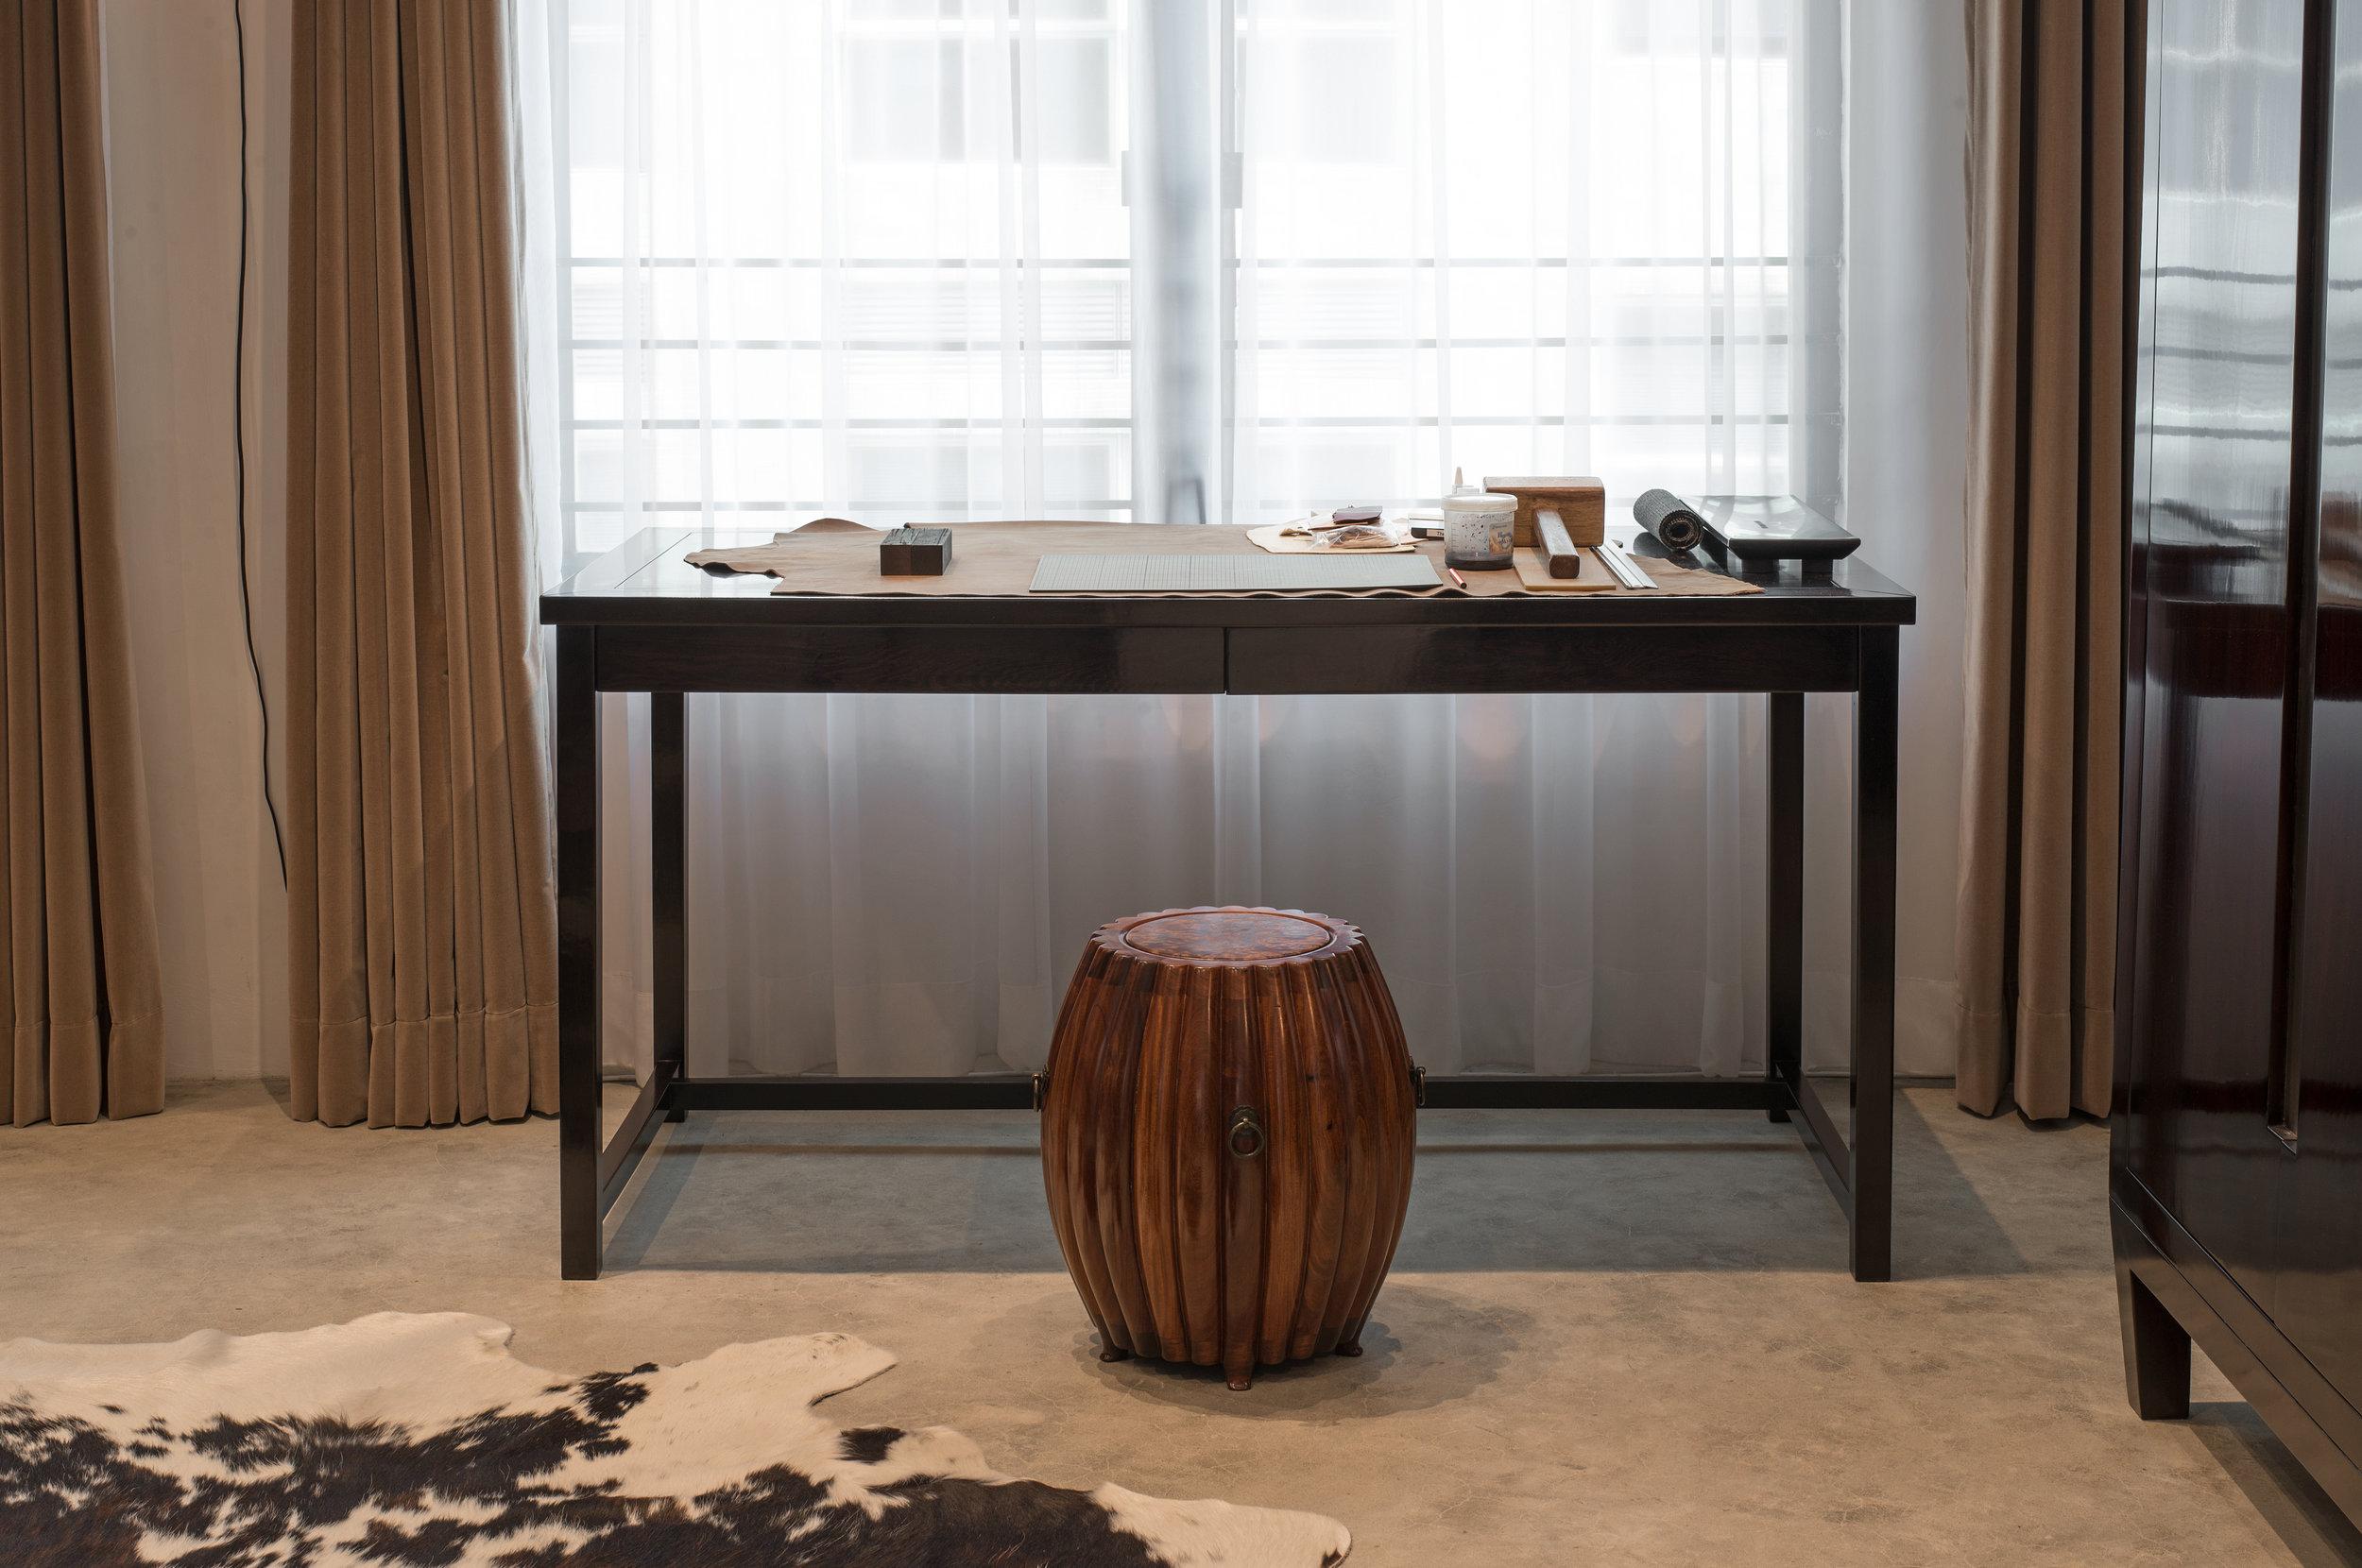 ....chinese furniture : desk and drum stool..中式家具 :书台与鼓凳....